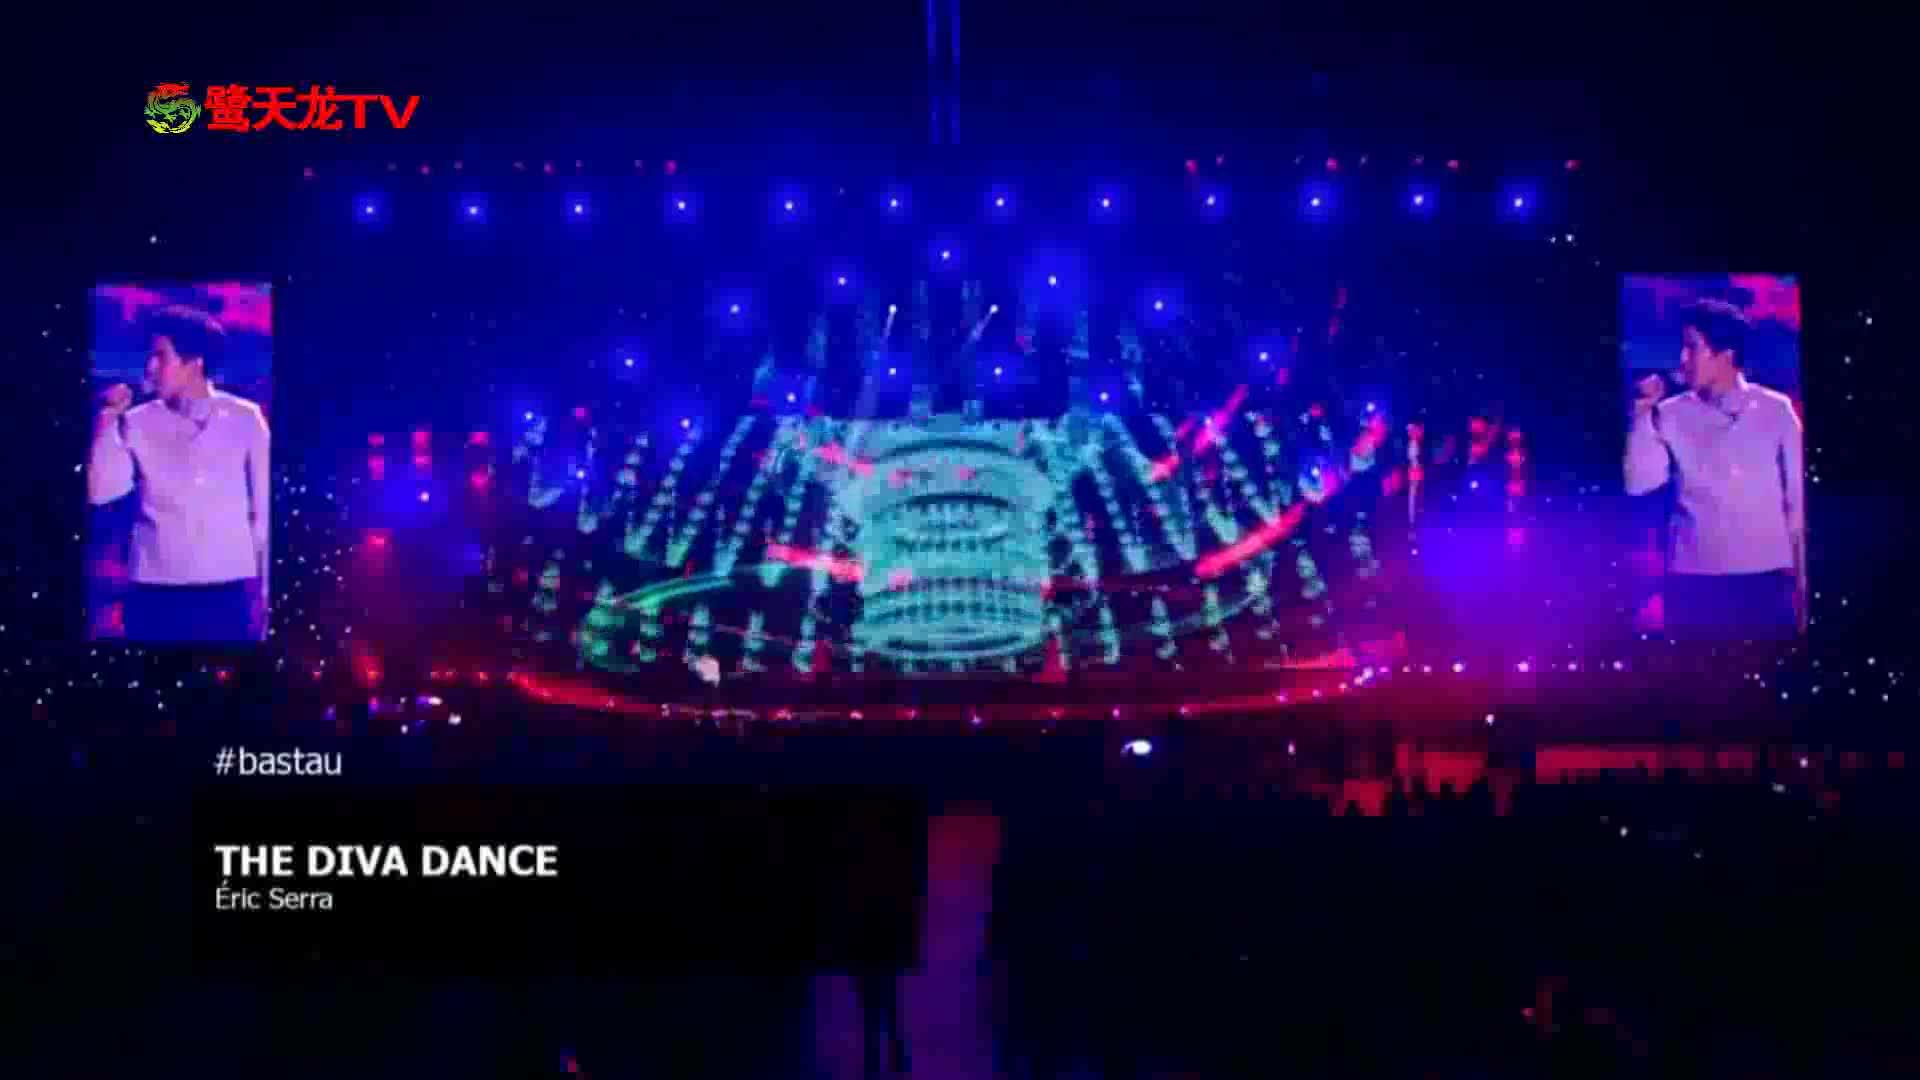 迪玛希bastau演唱会《THE DIVA DANCE》